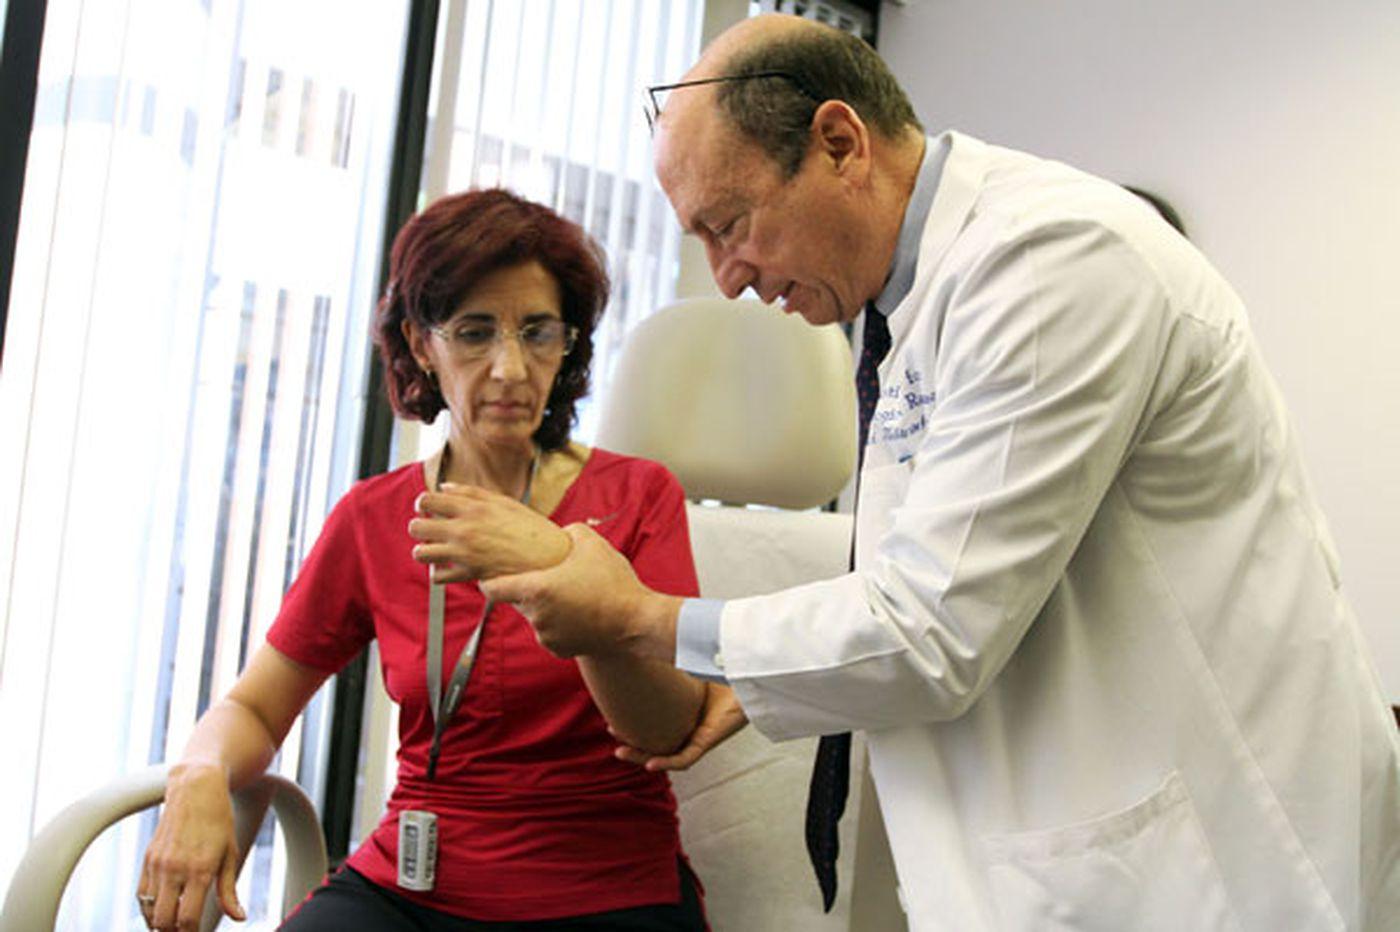 Florida doctor gives stroke survivors new shot at mobility, independence